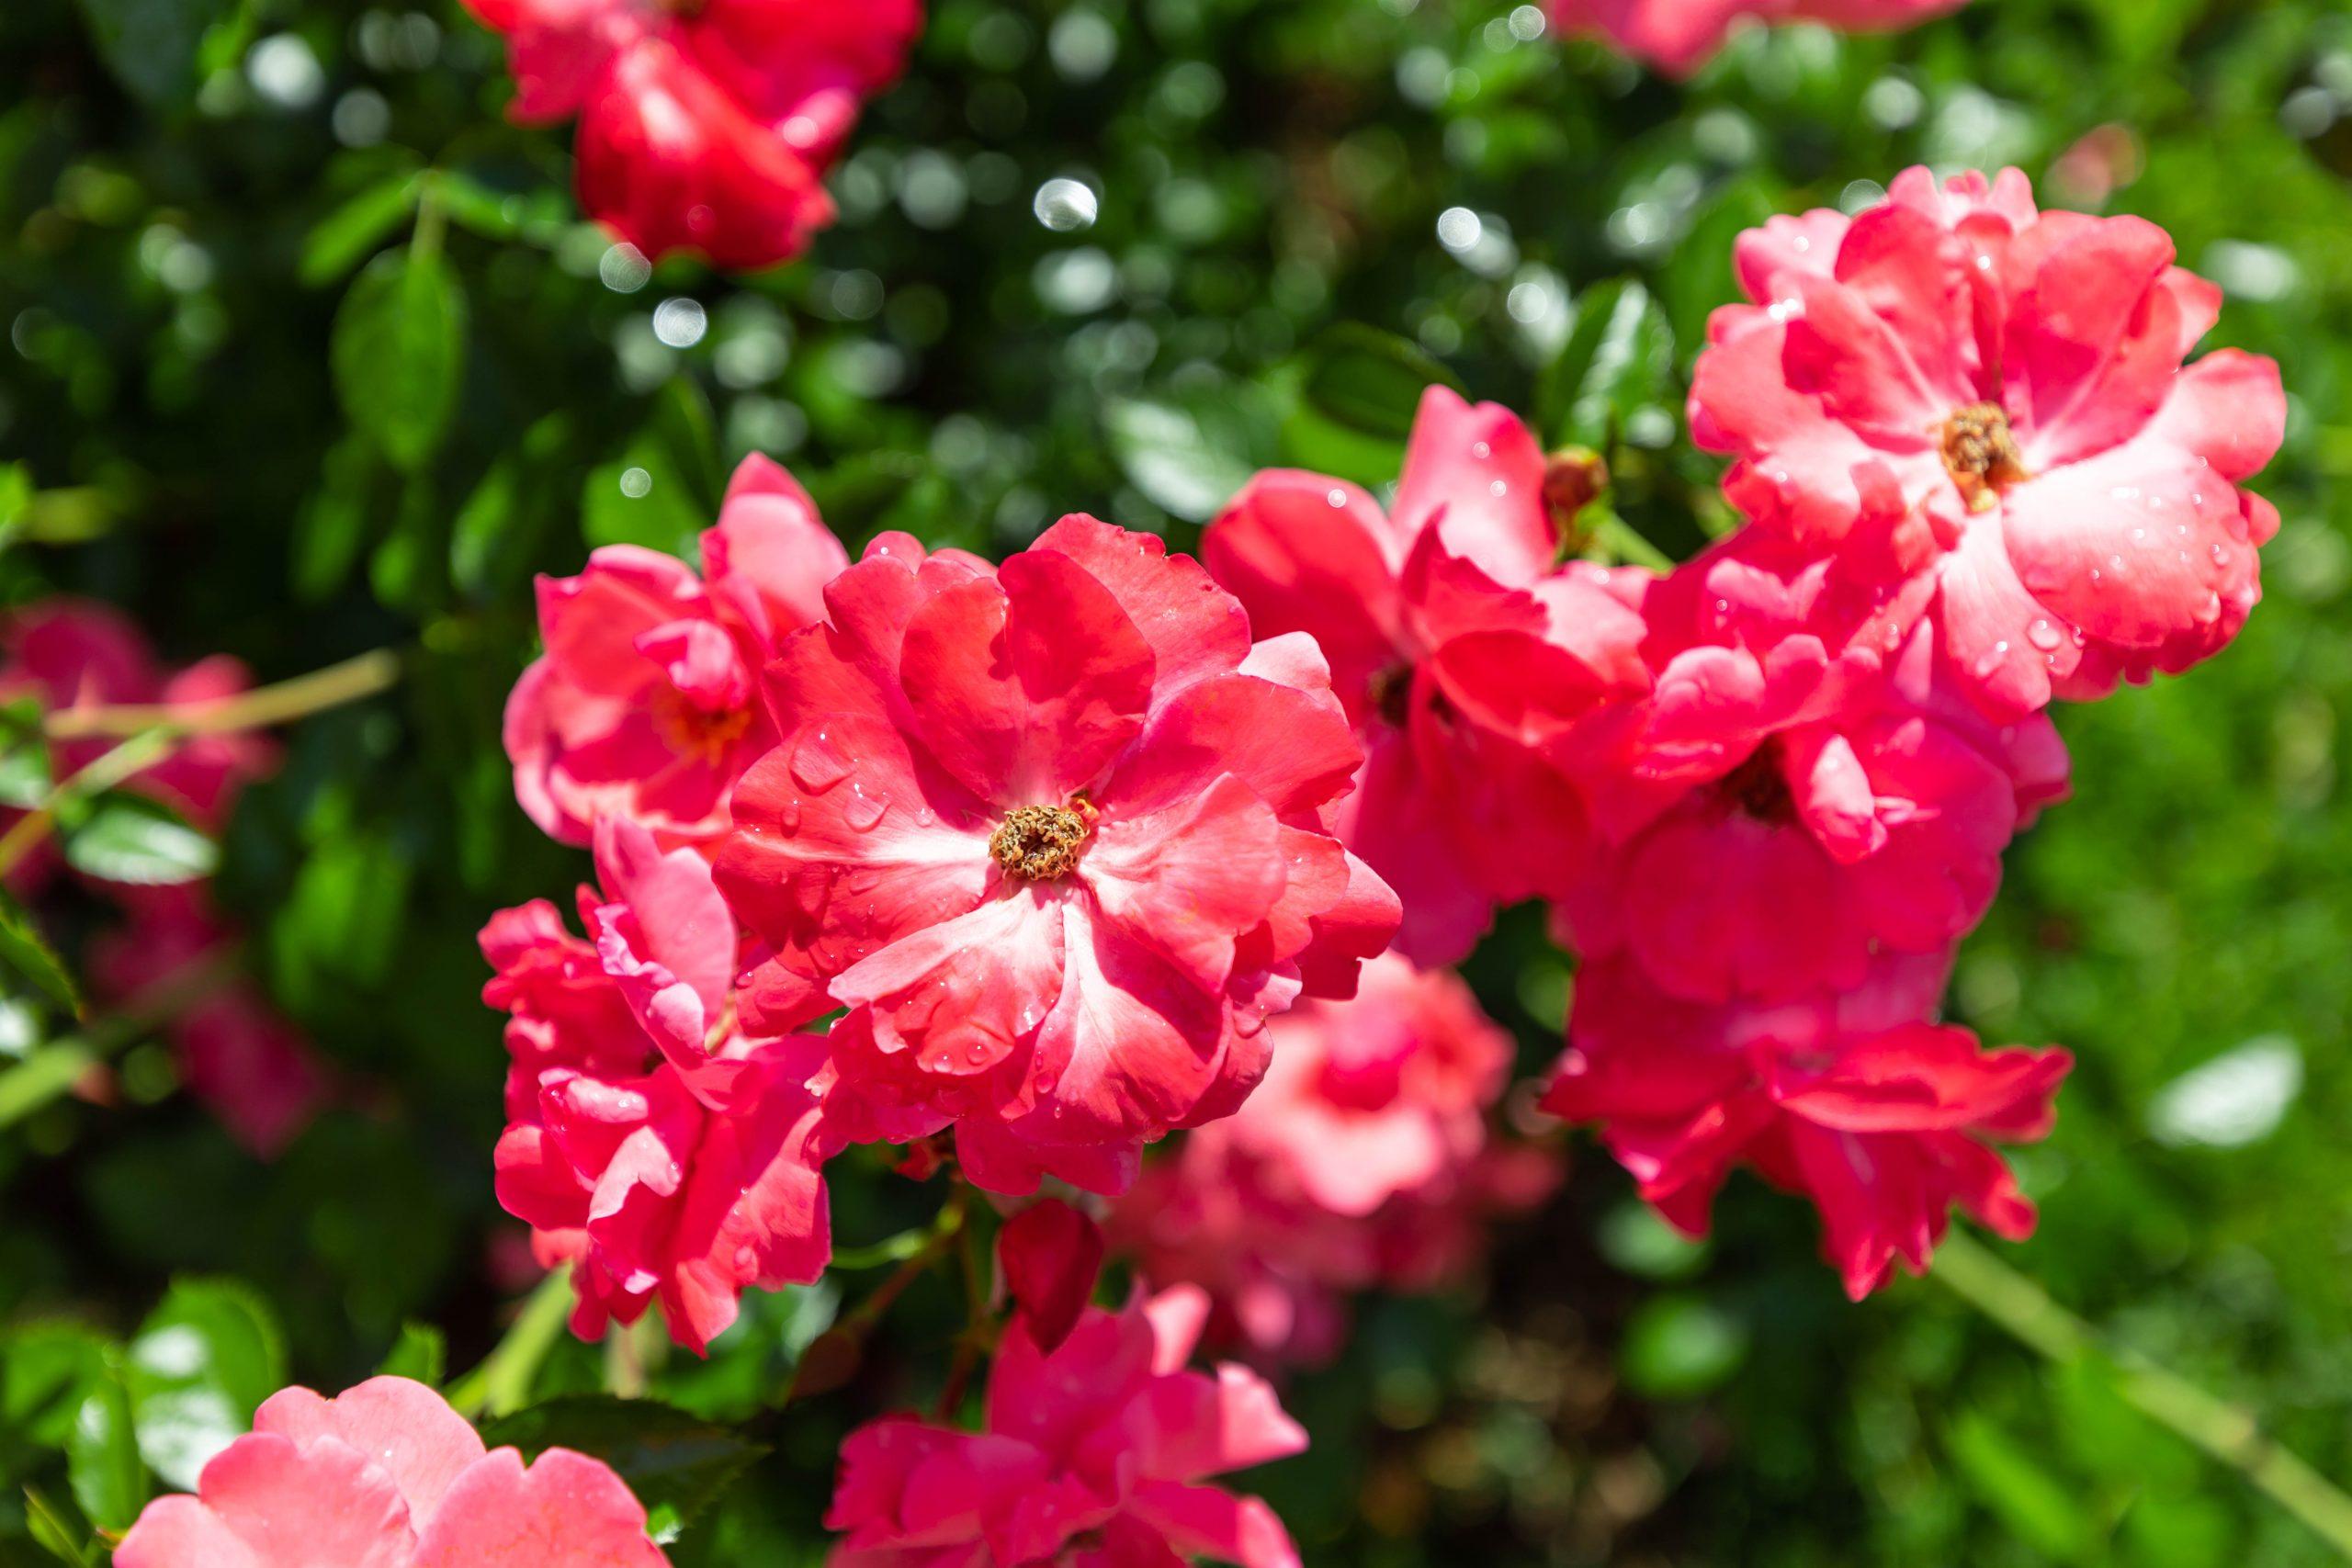 The Helen S Kaman Rose Garden within Elizabeth Park in Hartford, Connecticut Photographed by Annie Fairfax